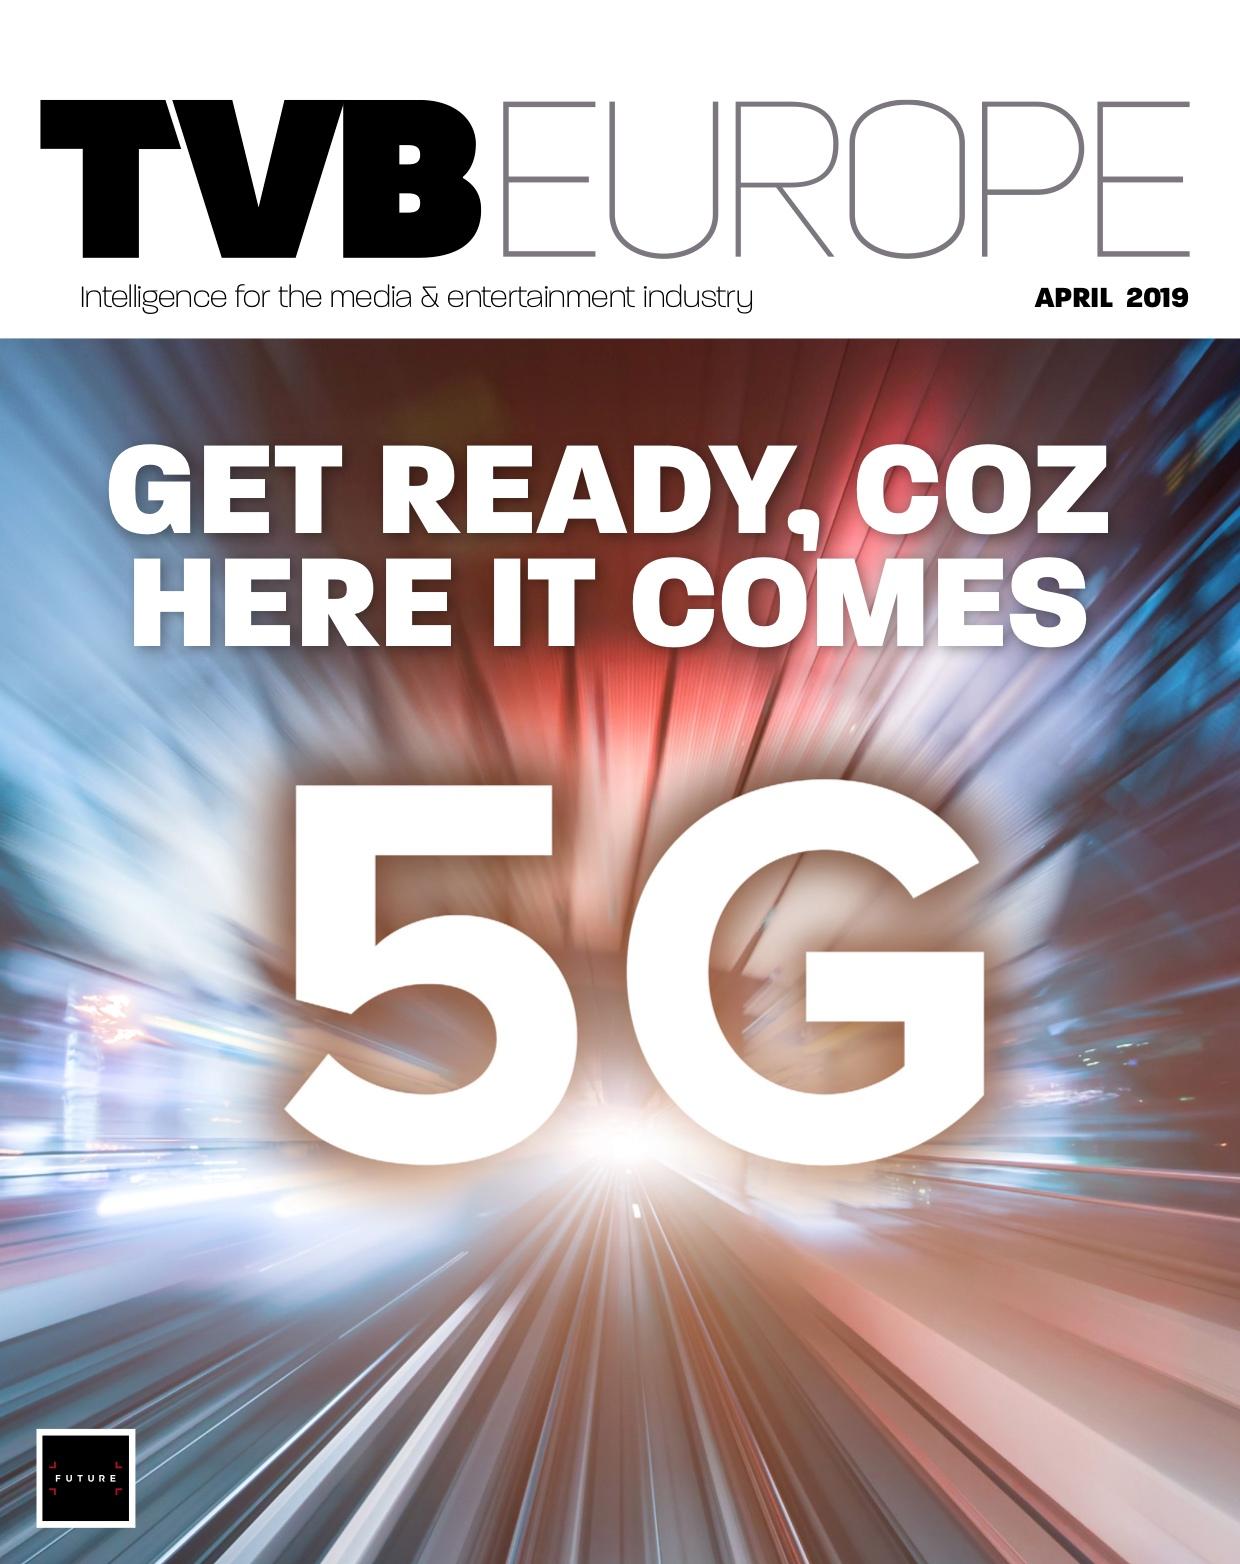 tvb63.digital_may_june2019+%28dragged%29+2.jpg